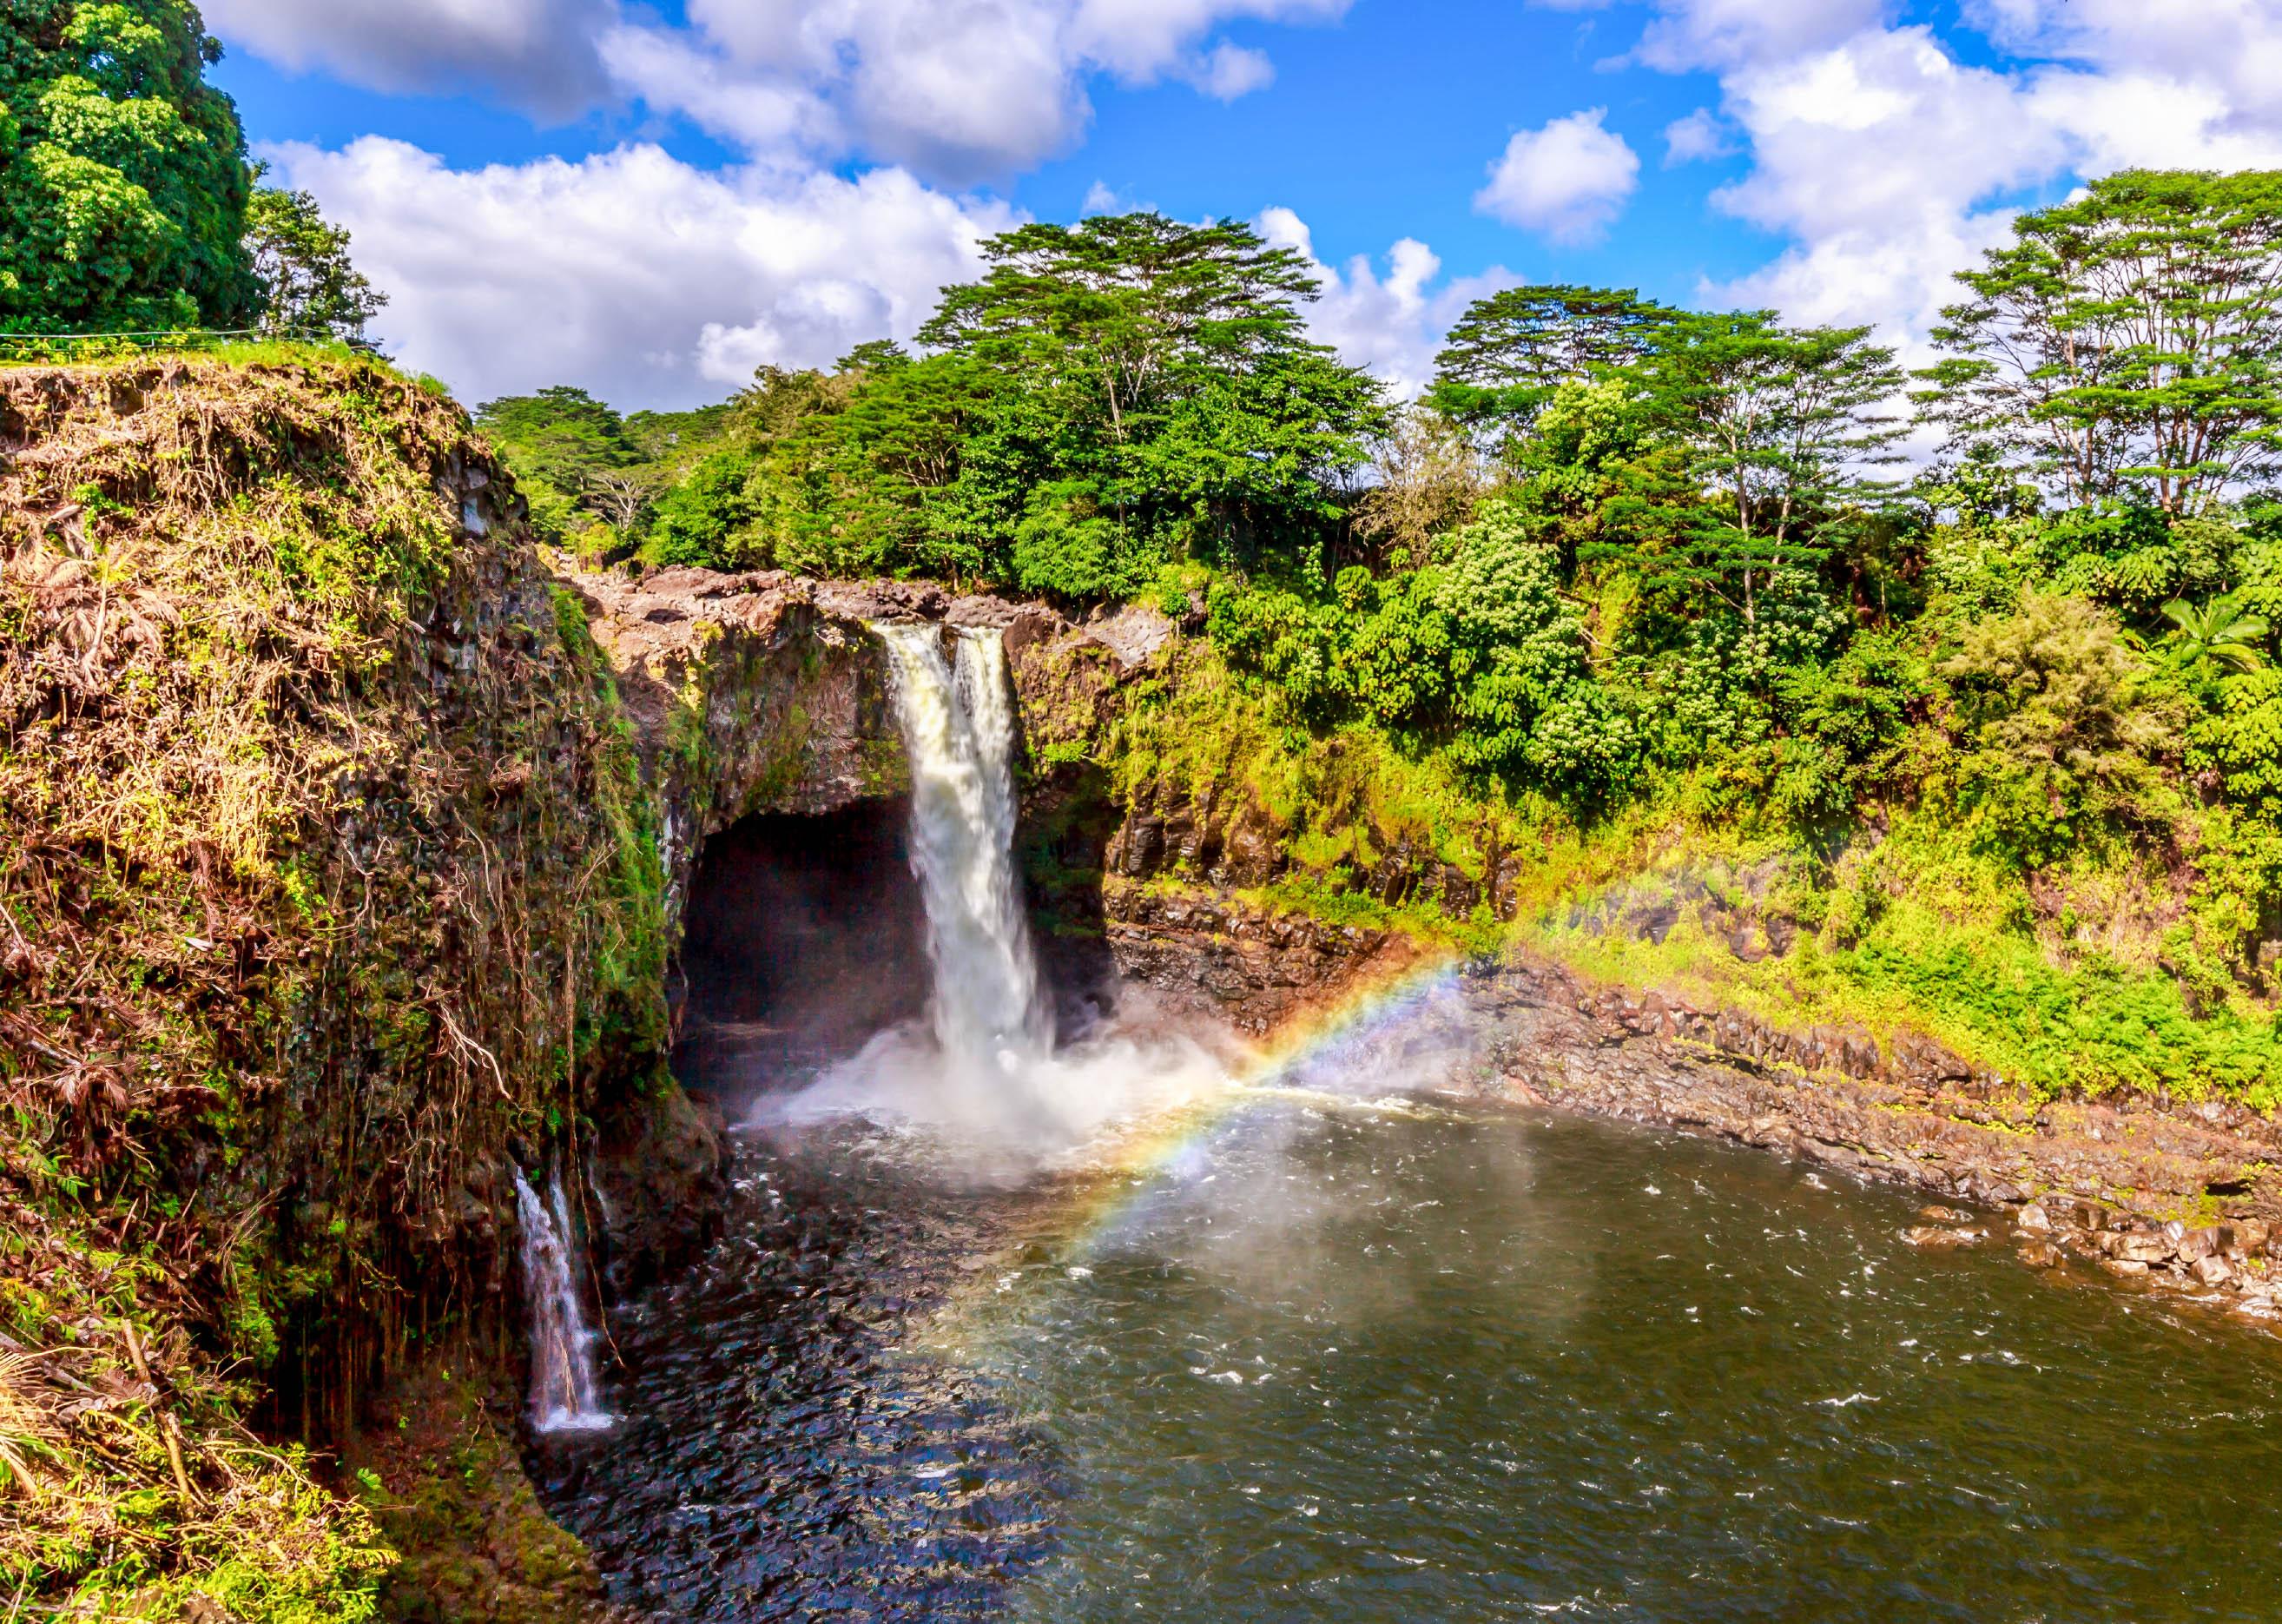 Orte auf Hawaii, Wasserfall, Regenbogen, Rainbow Falls